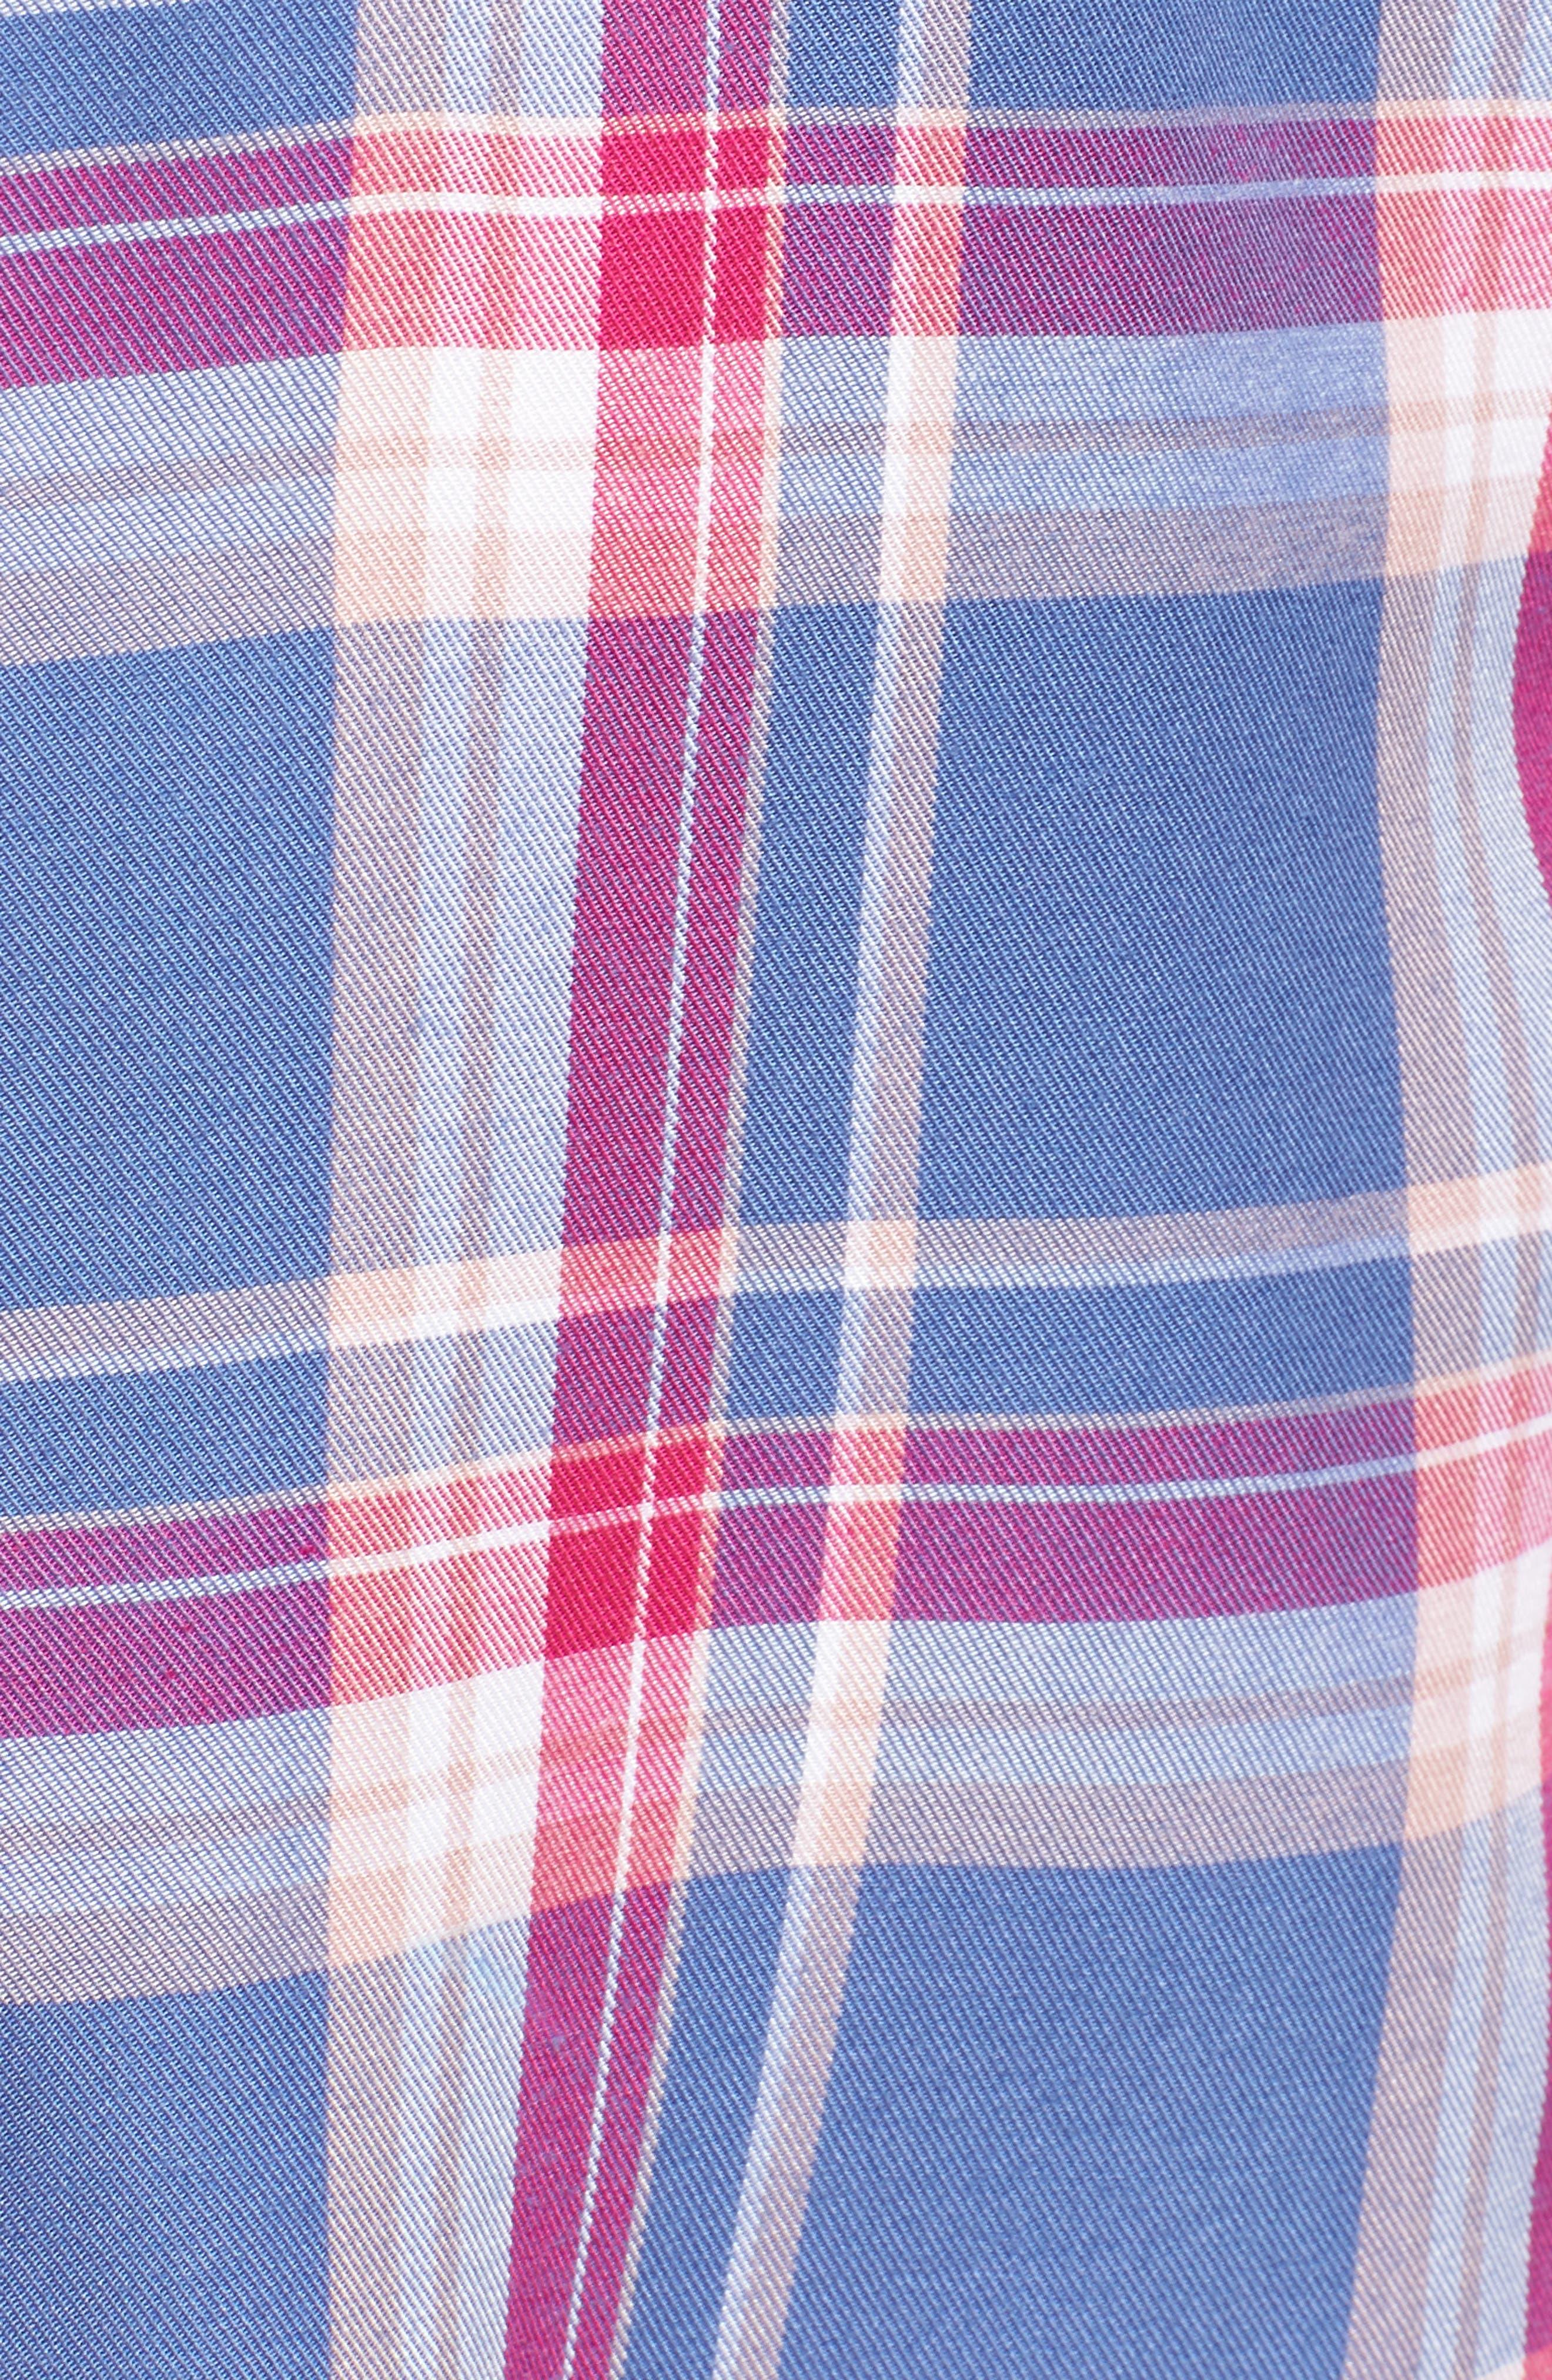 Plaid Boyfriend Shirt,                             Alternate thumbnail 23, color,